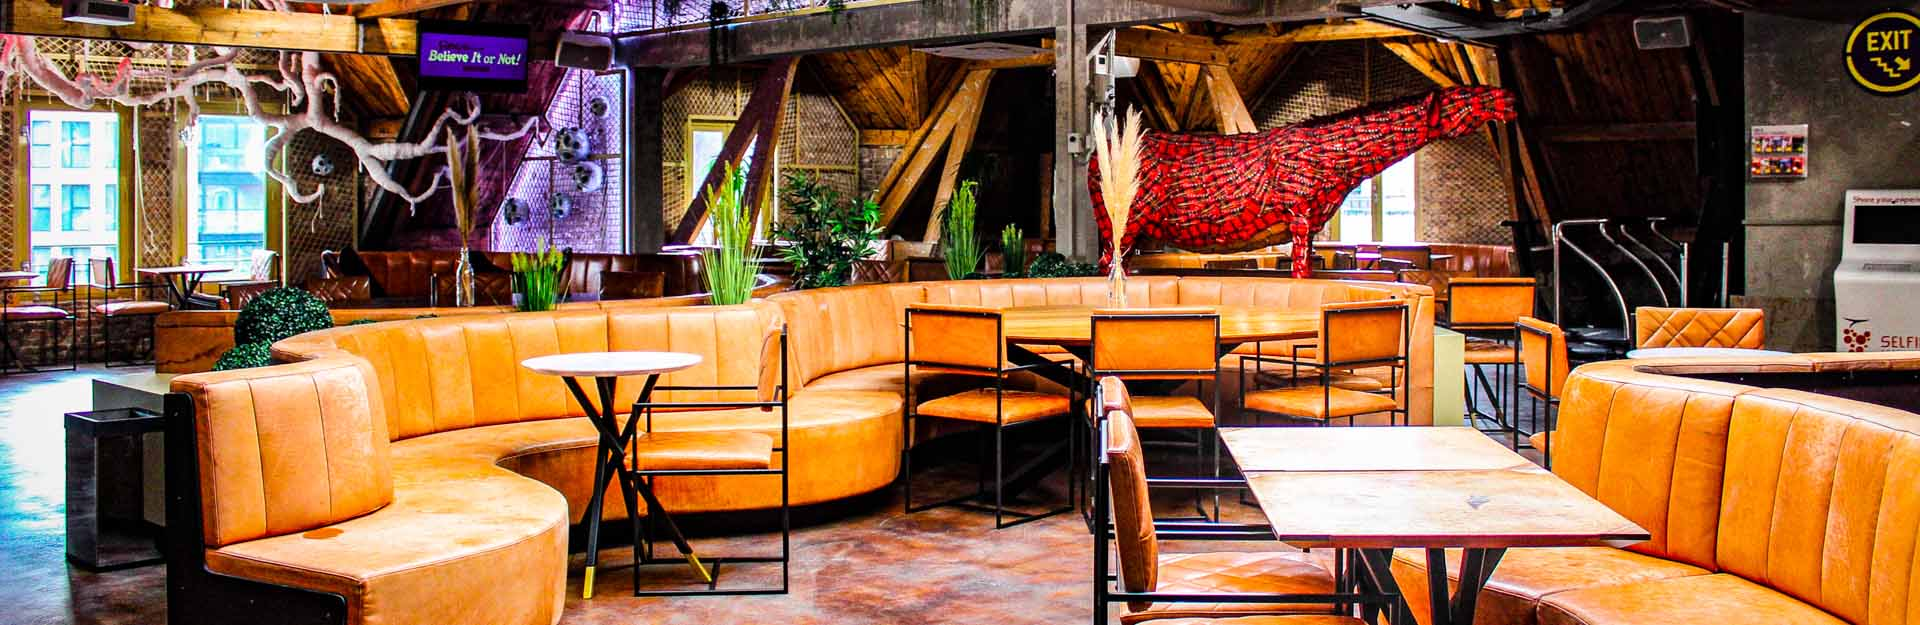 Ripley's Amsterdam Lounge